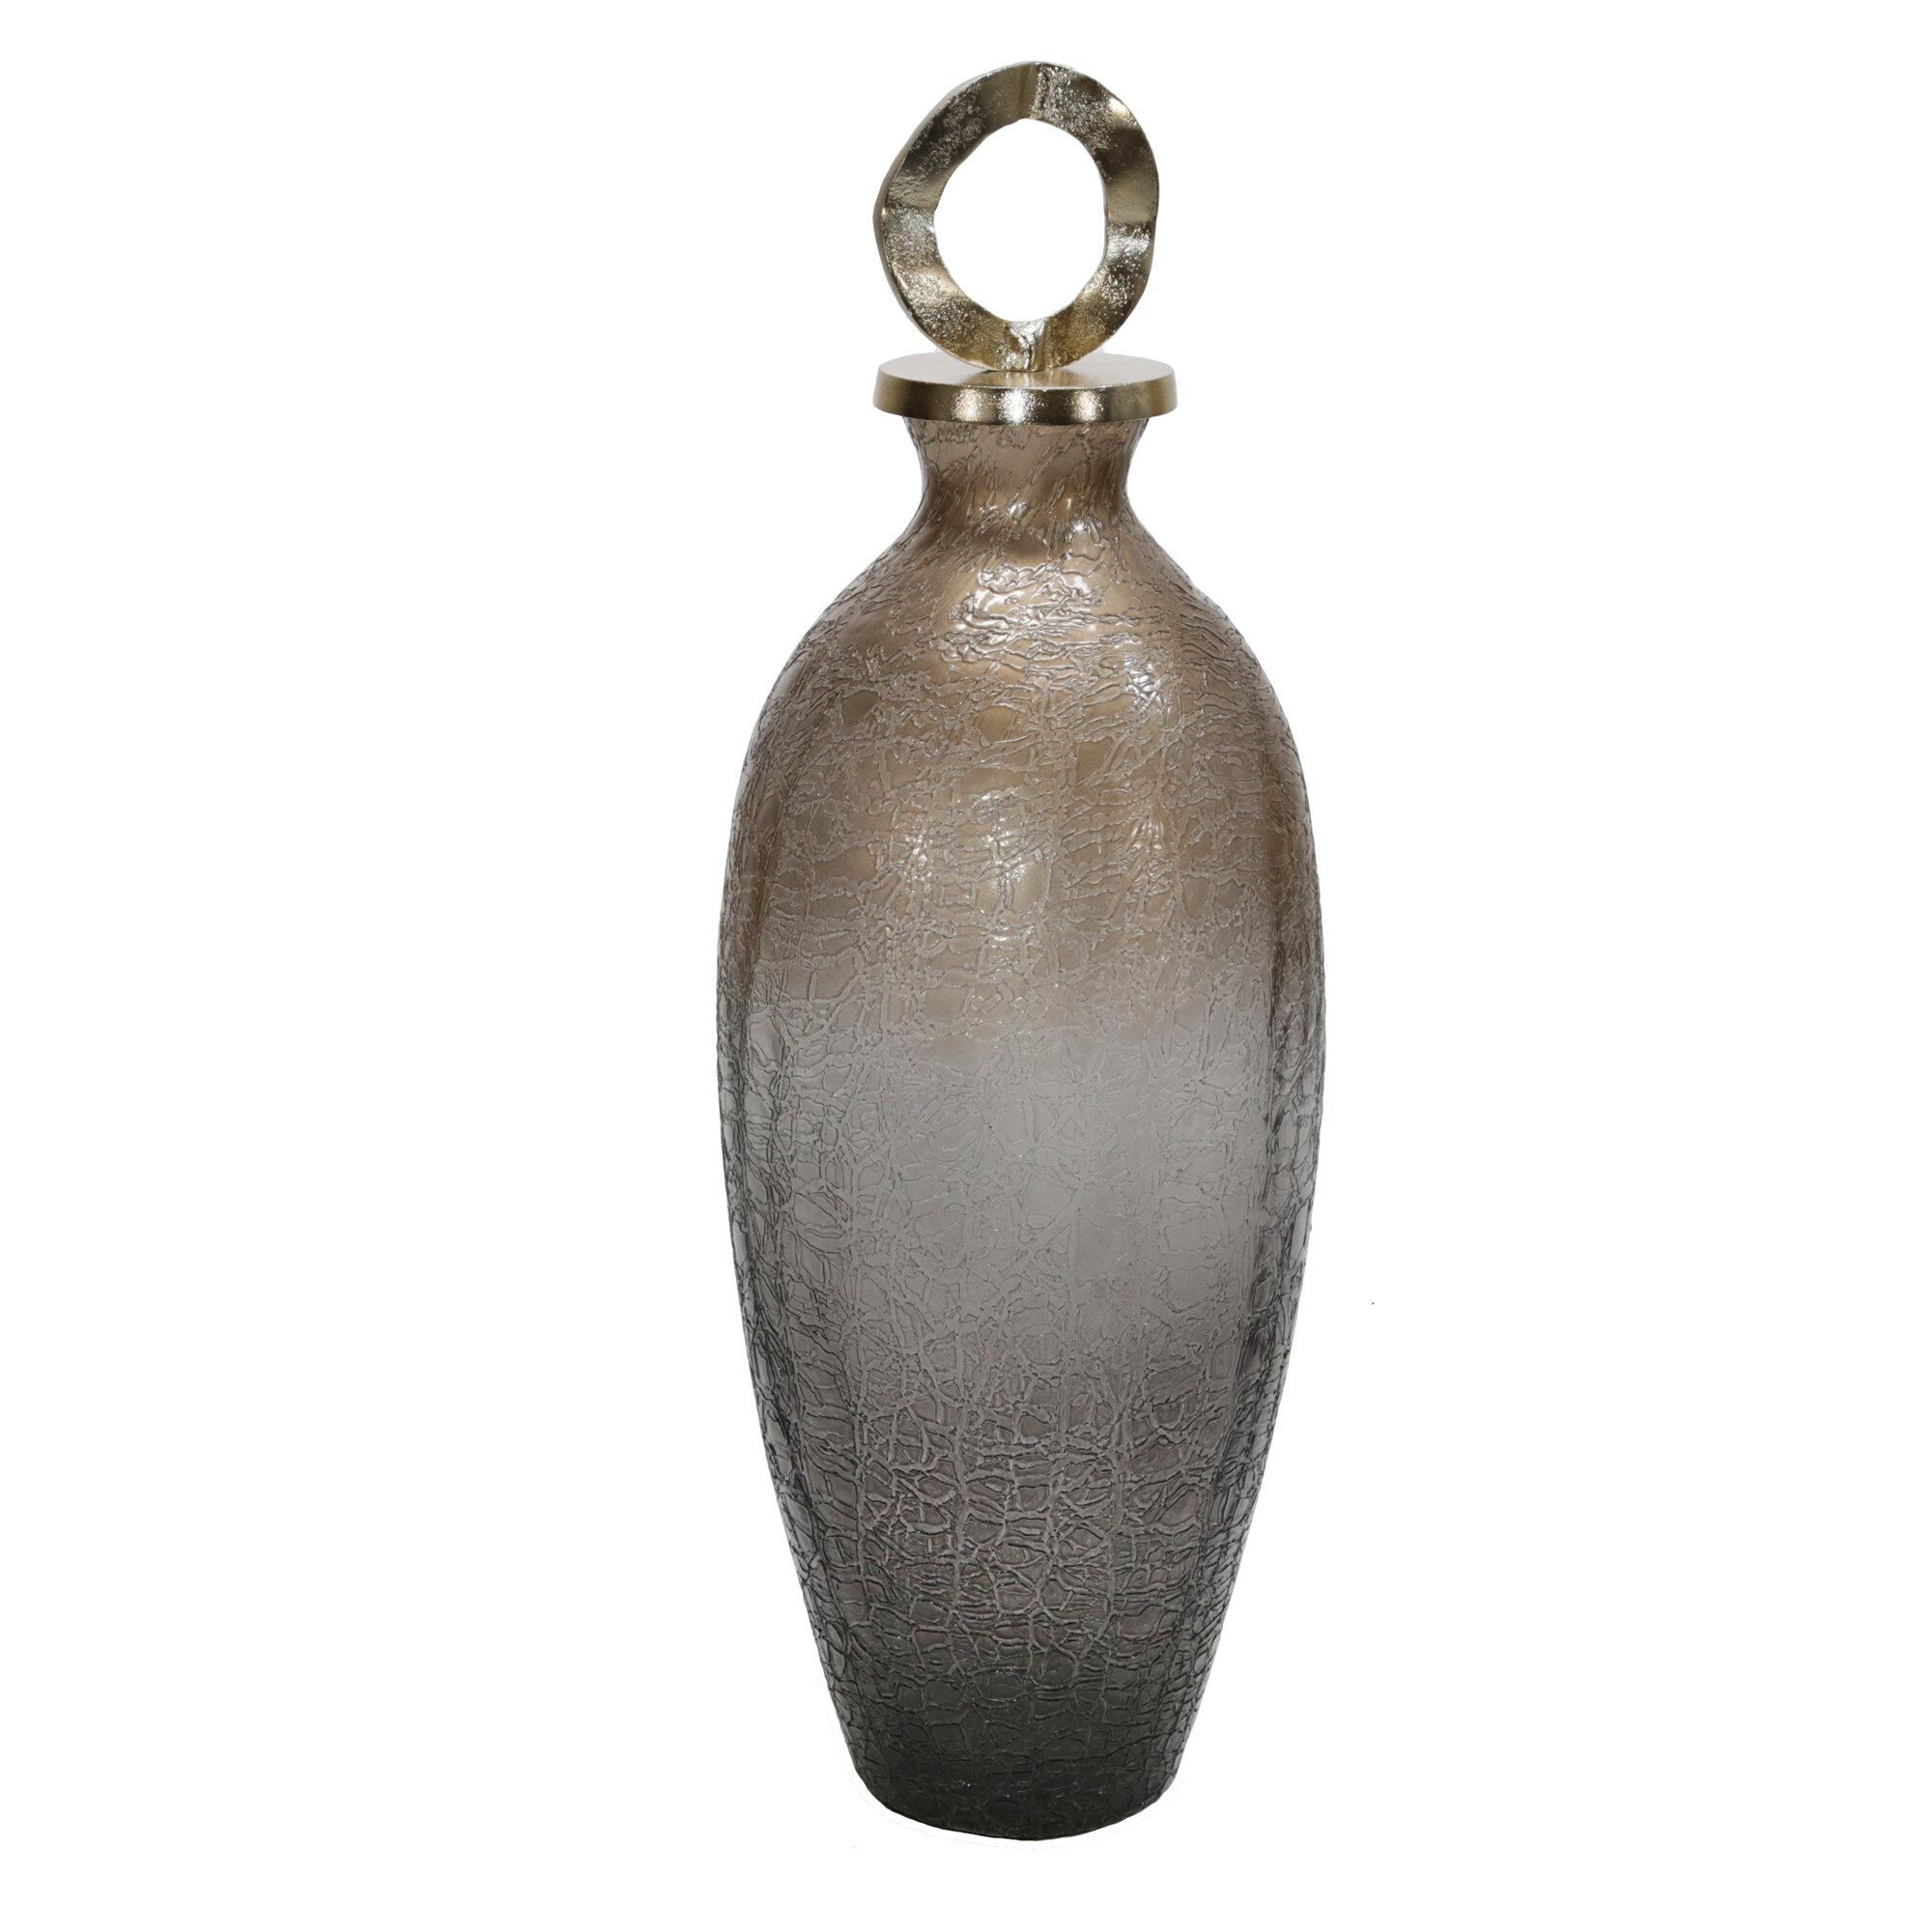 Urns Jars Wrought Studio Vases Urns Jars Bottles You Ll Love In 2021 Wayfair